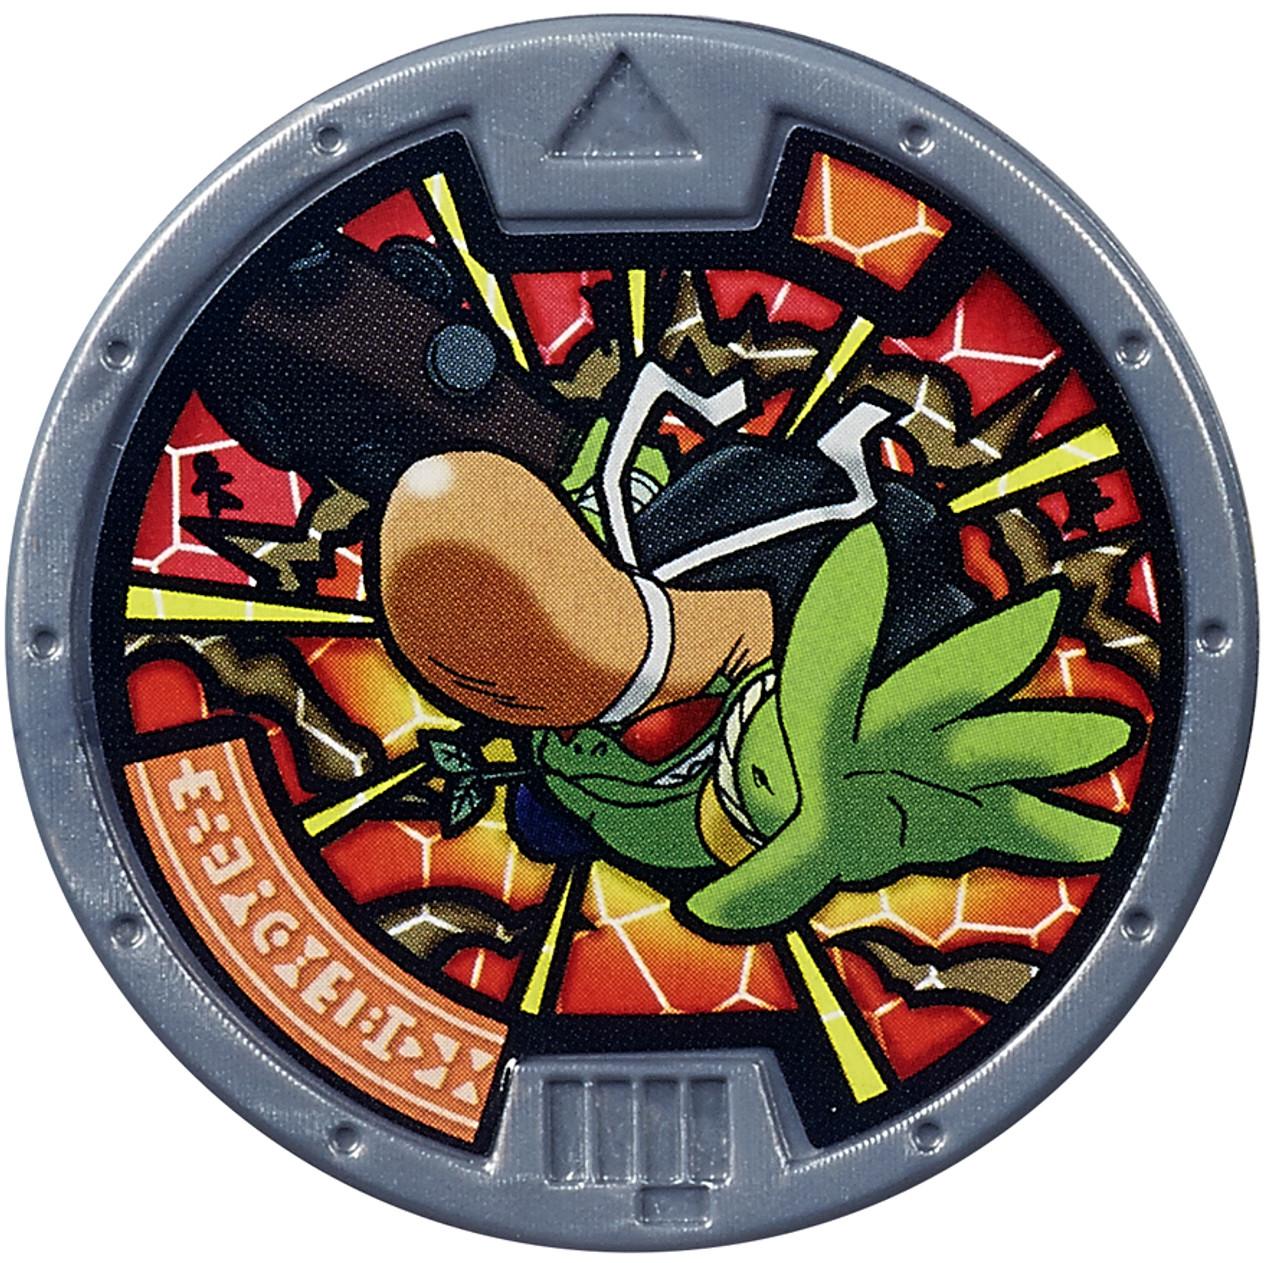 Yo kai watch series 1 badude medal loose hasbro toys toywiz for Decoration yo kai watch